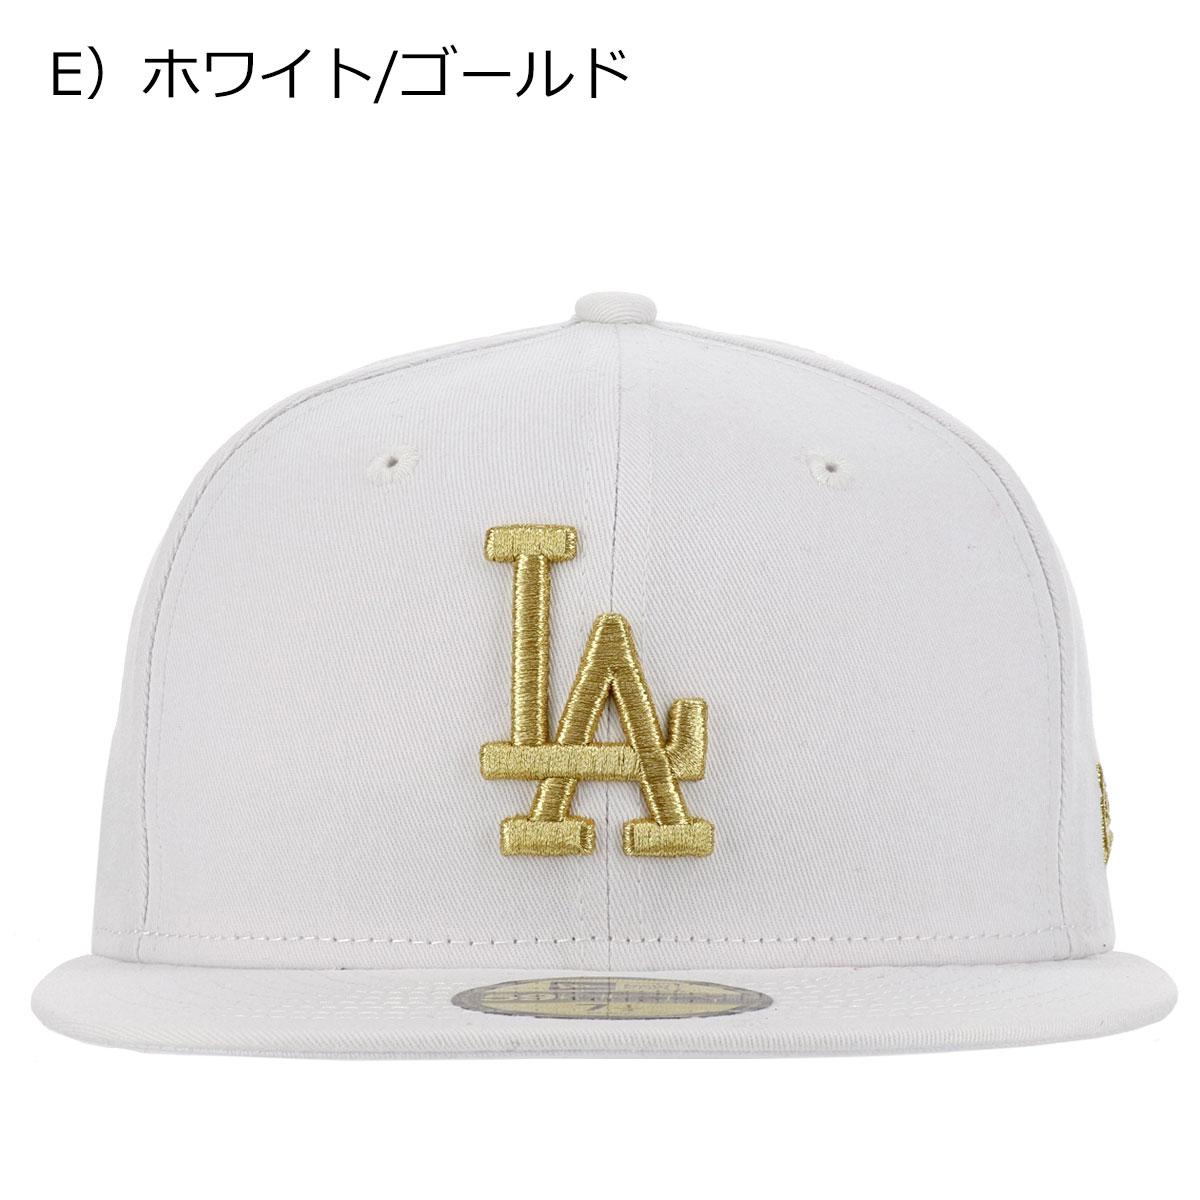 E)ホワイト/ゴールド